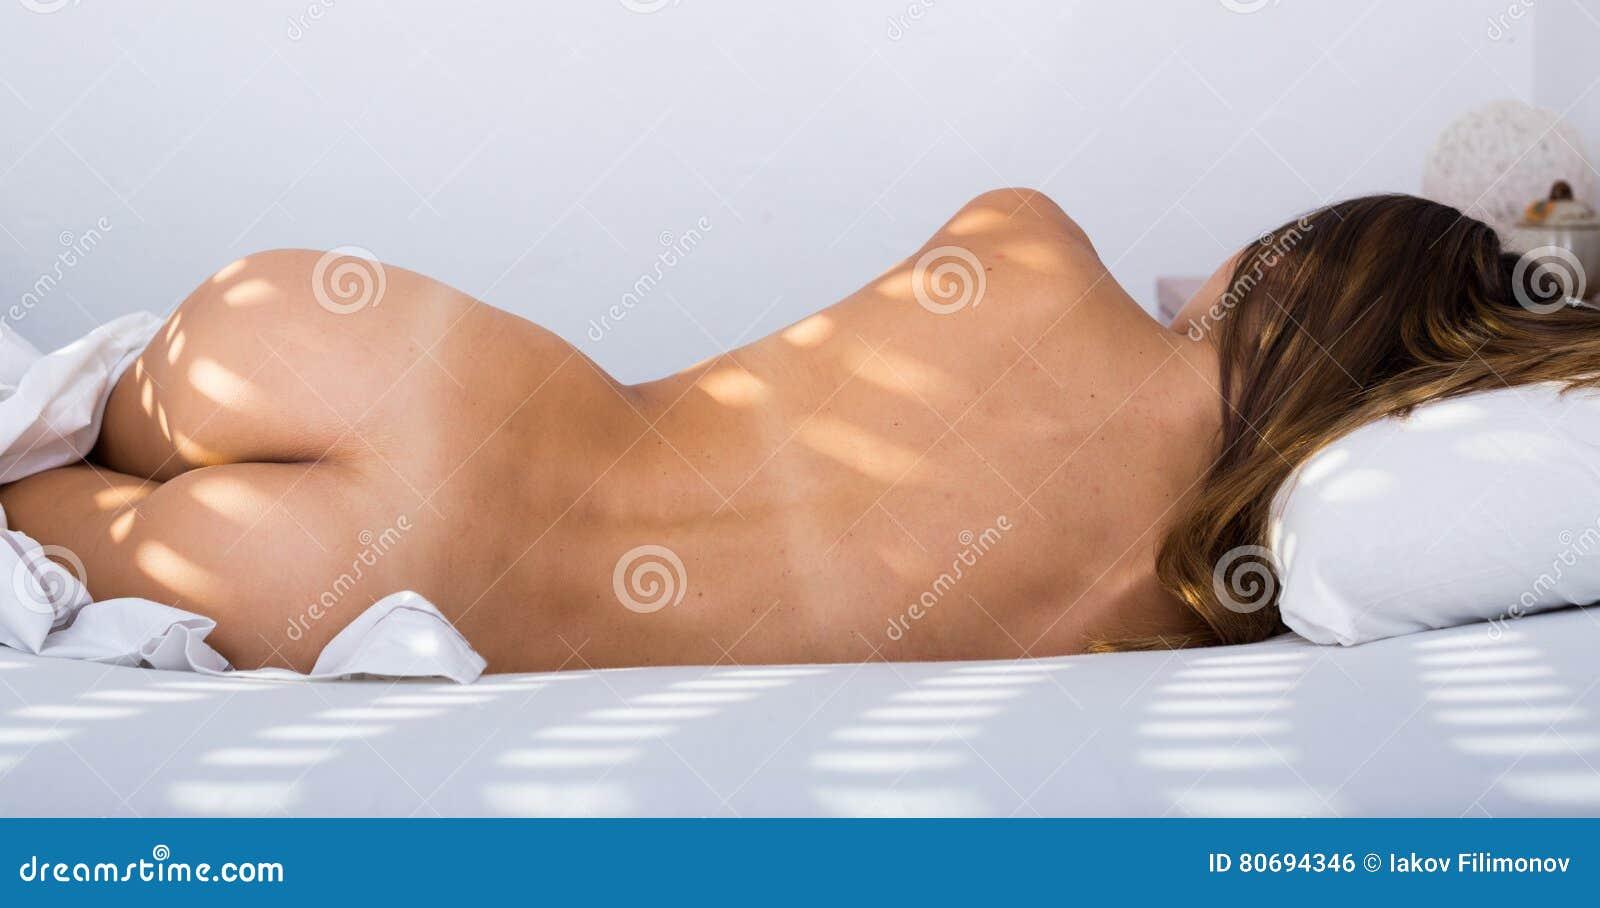 Women nude in bed sleeping